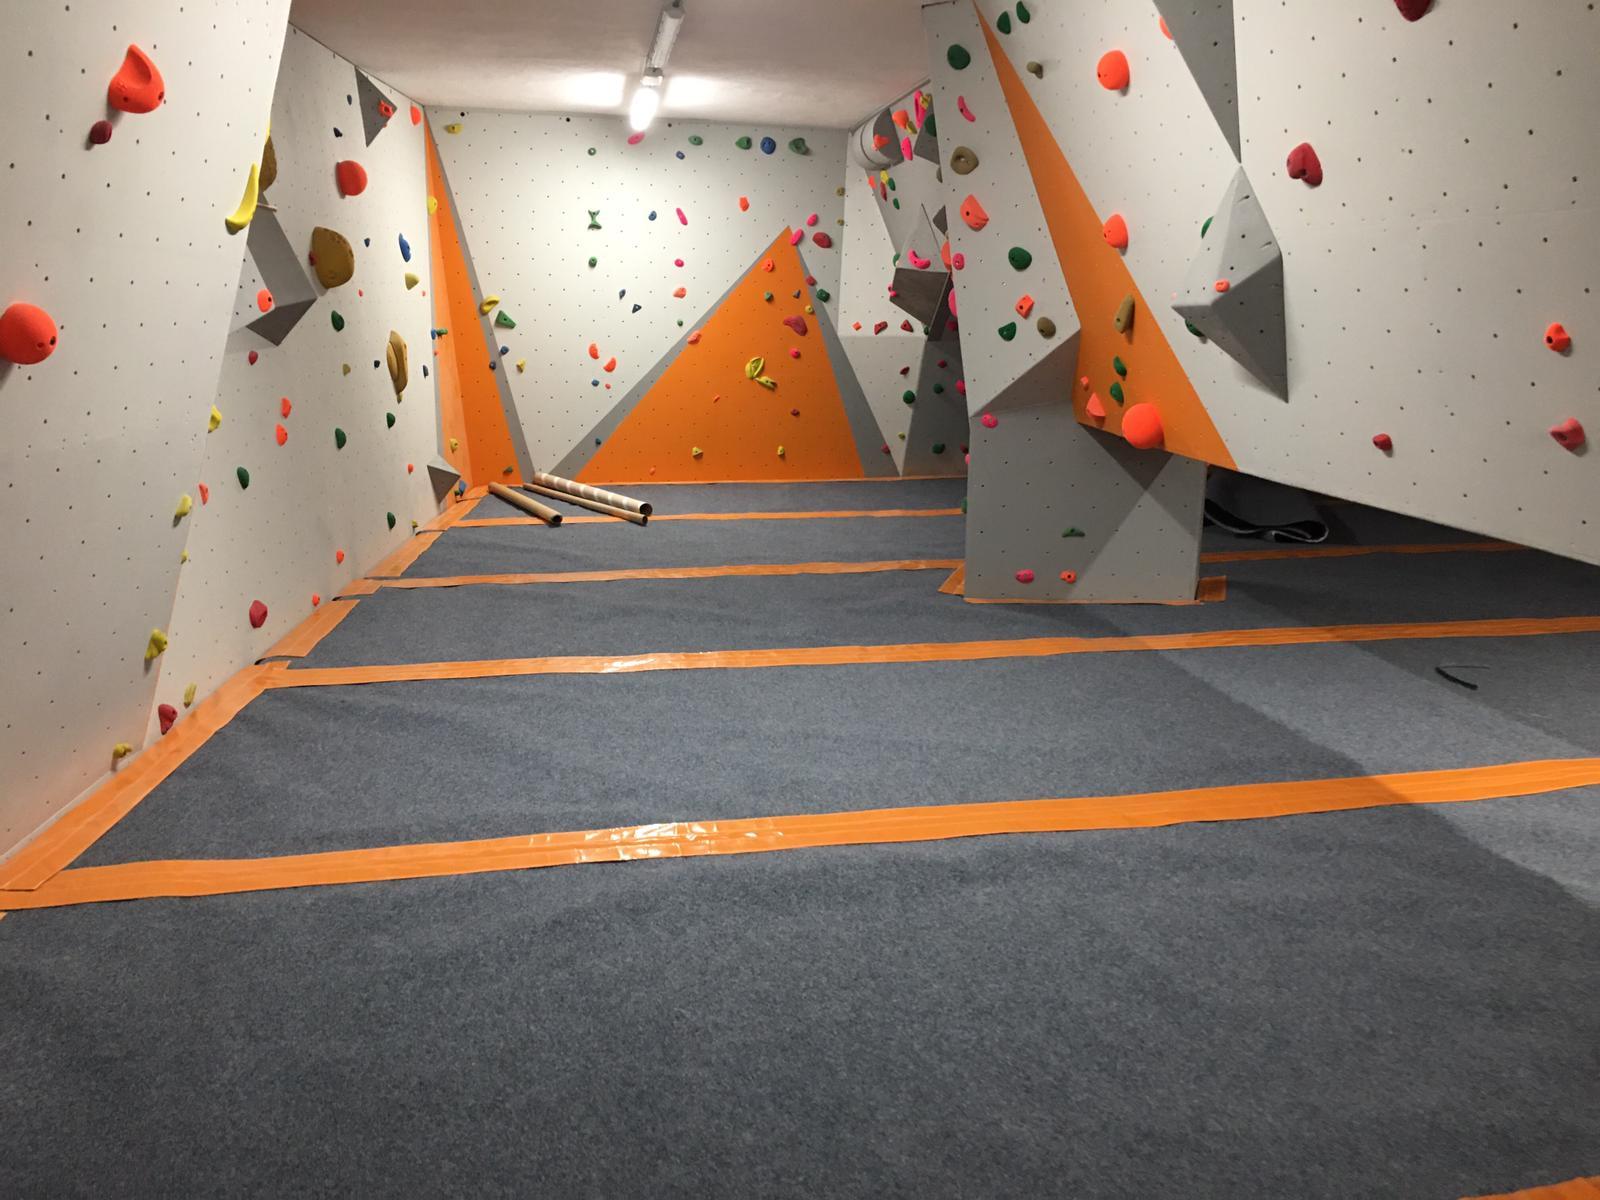 Salas de escalada